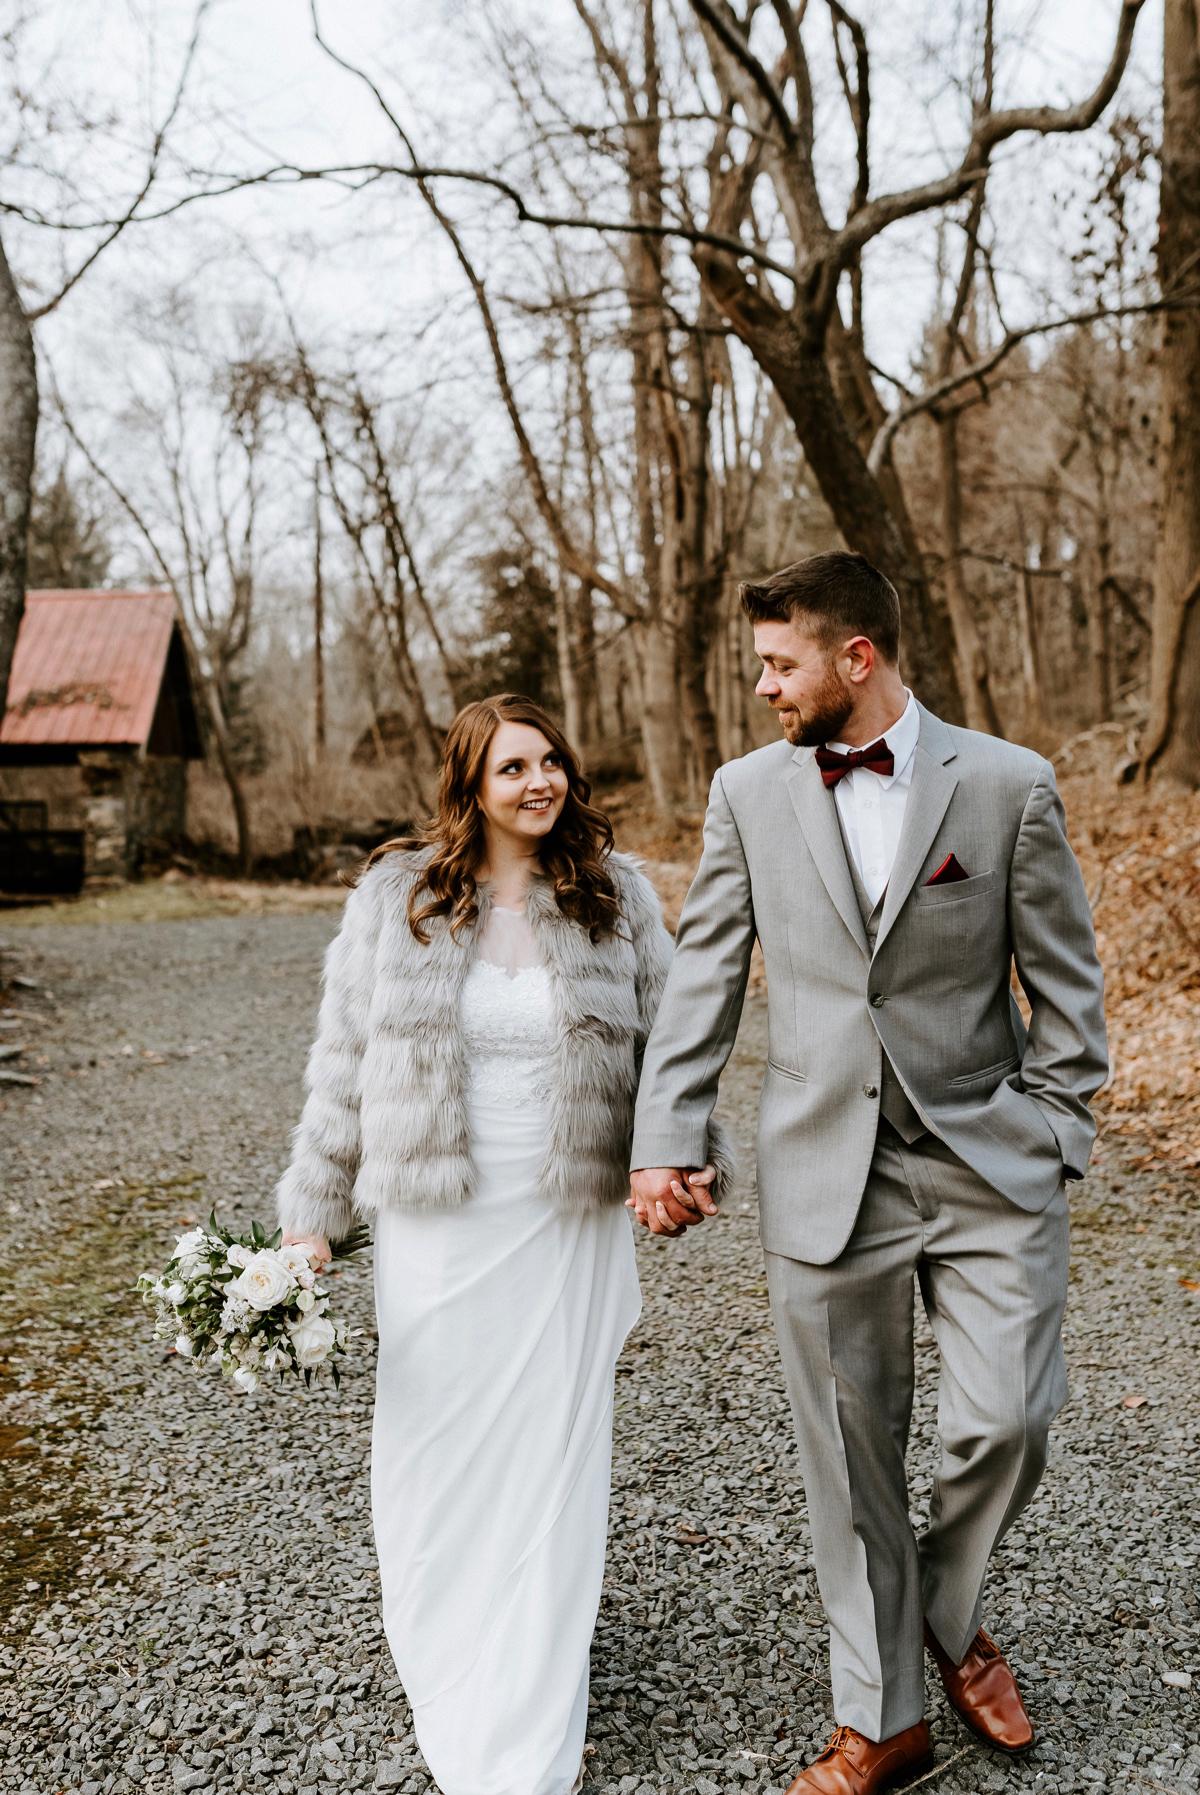 44 The Inn At Glencairn Destination Wedding Photographer Winter Elopement New Jersey Wedding Photographer Intimate Wedding